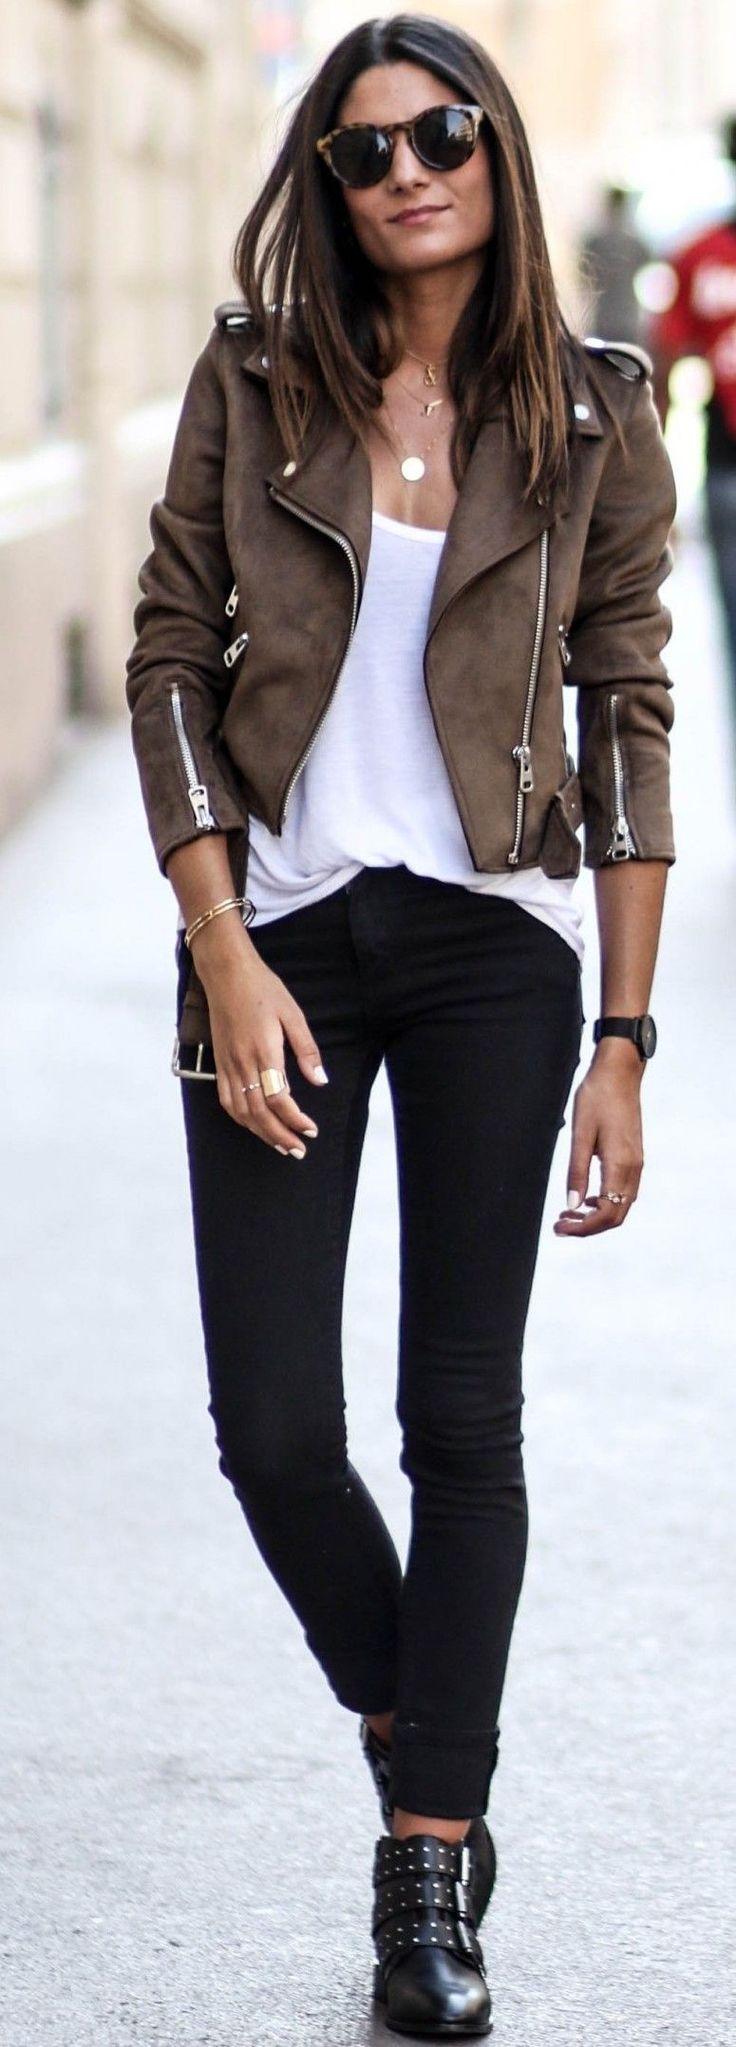 Suede Biker Jacket + White Tee + Black Jeans                                                                             Source